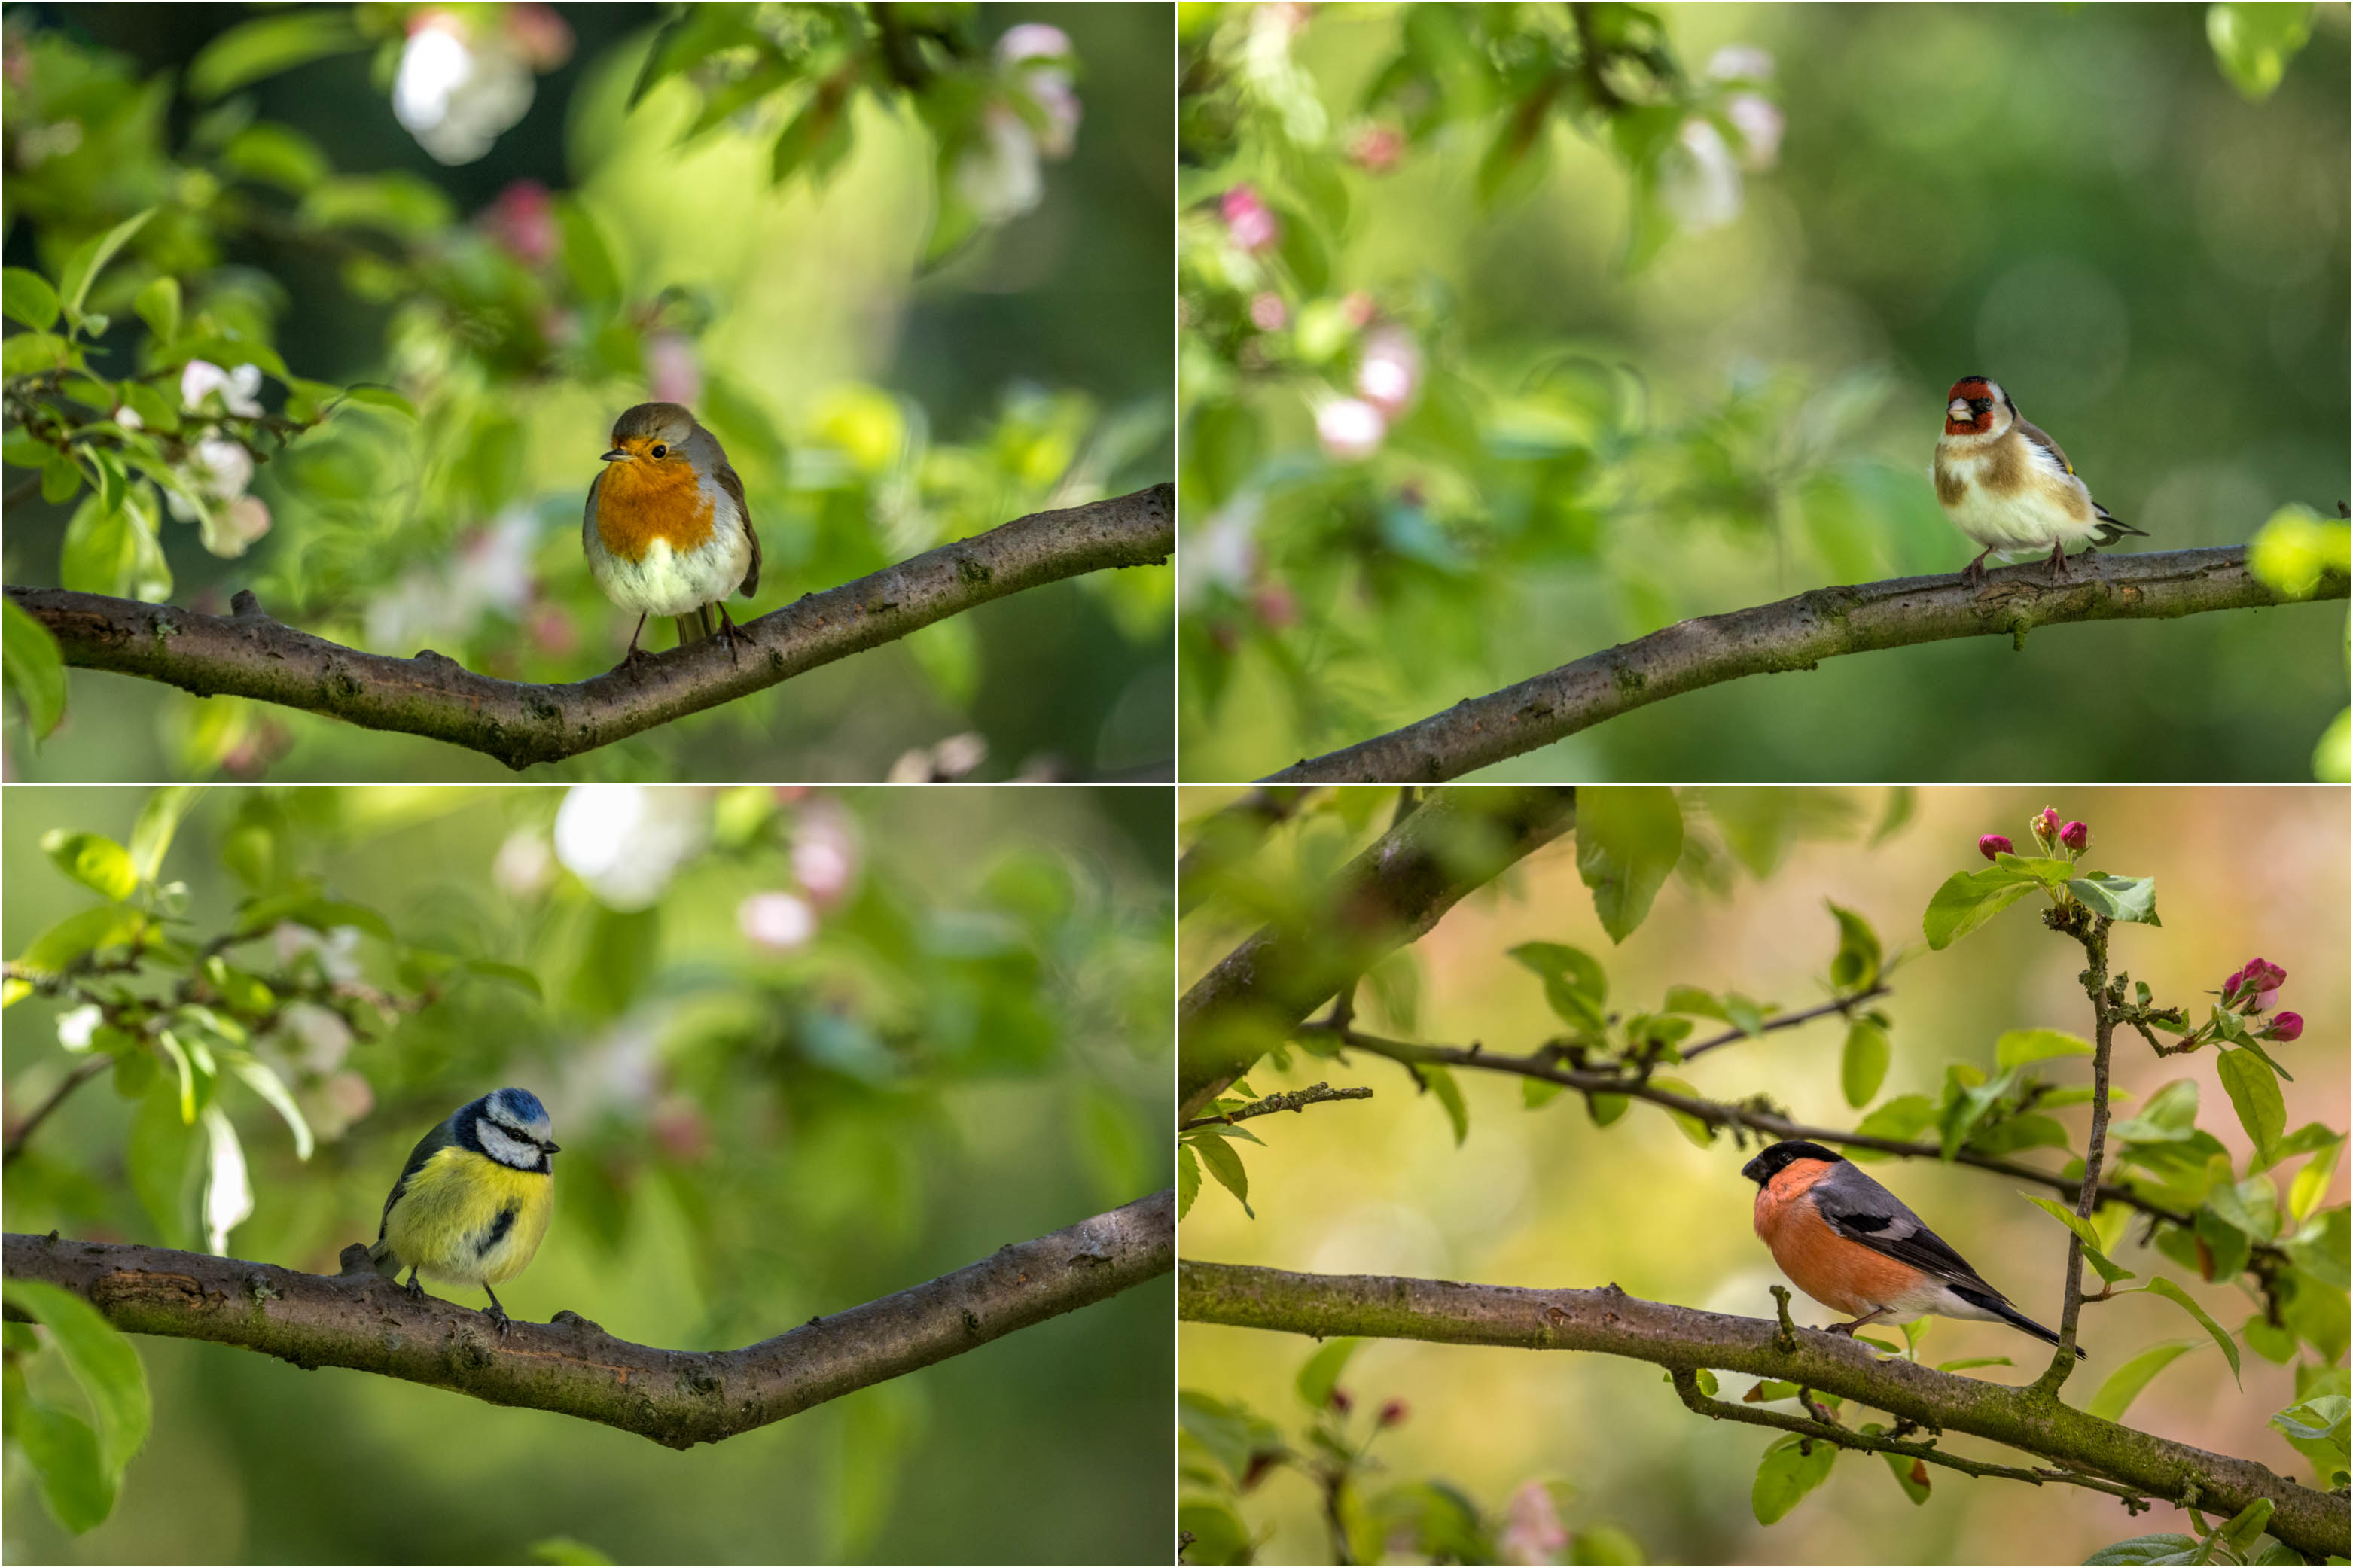 Robin, goldfinch, blue tit, bullfinch